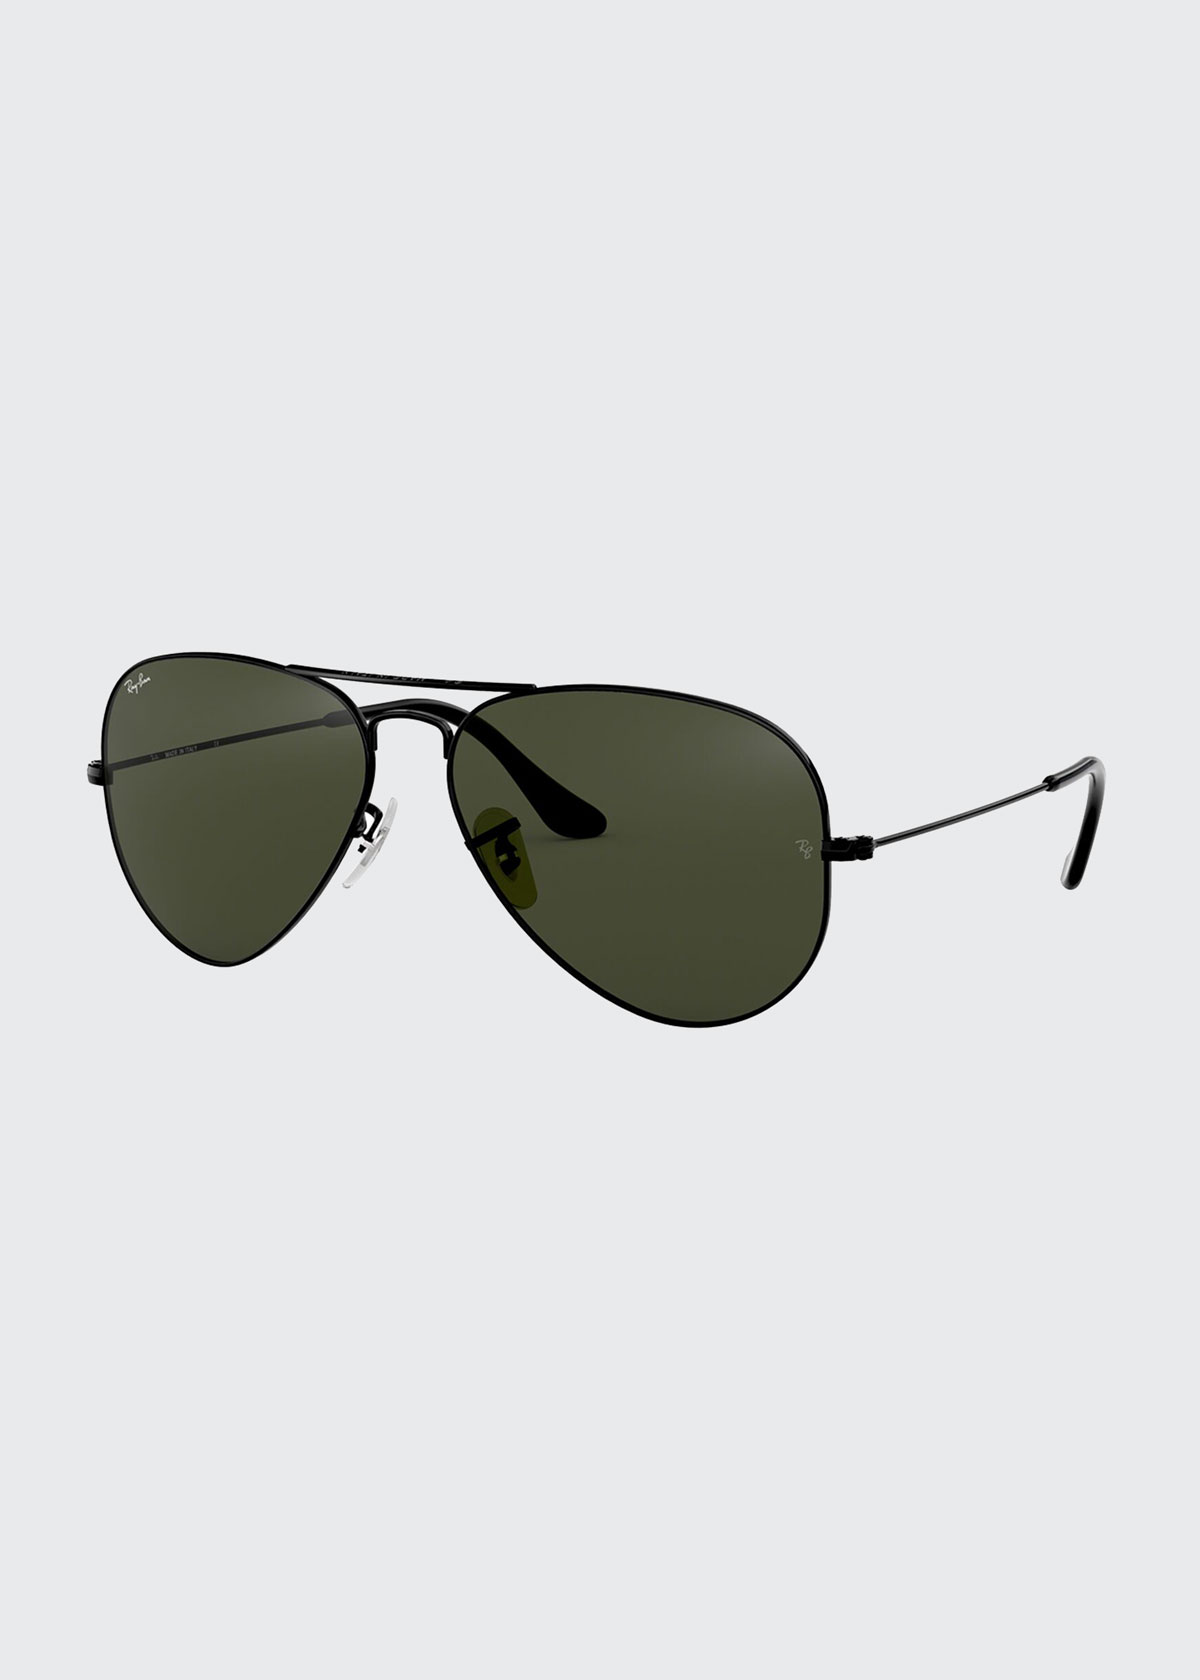 Ray-Ban Teardrop Aviator Sunglasses, Gold, Men's